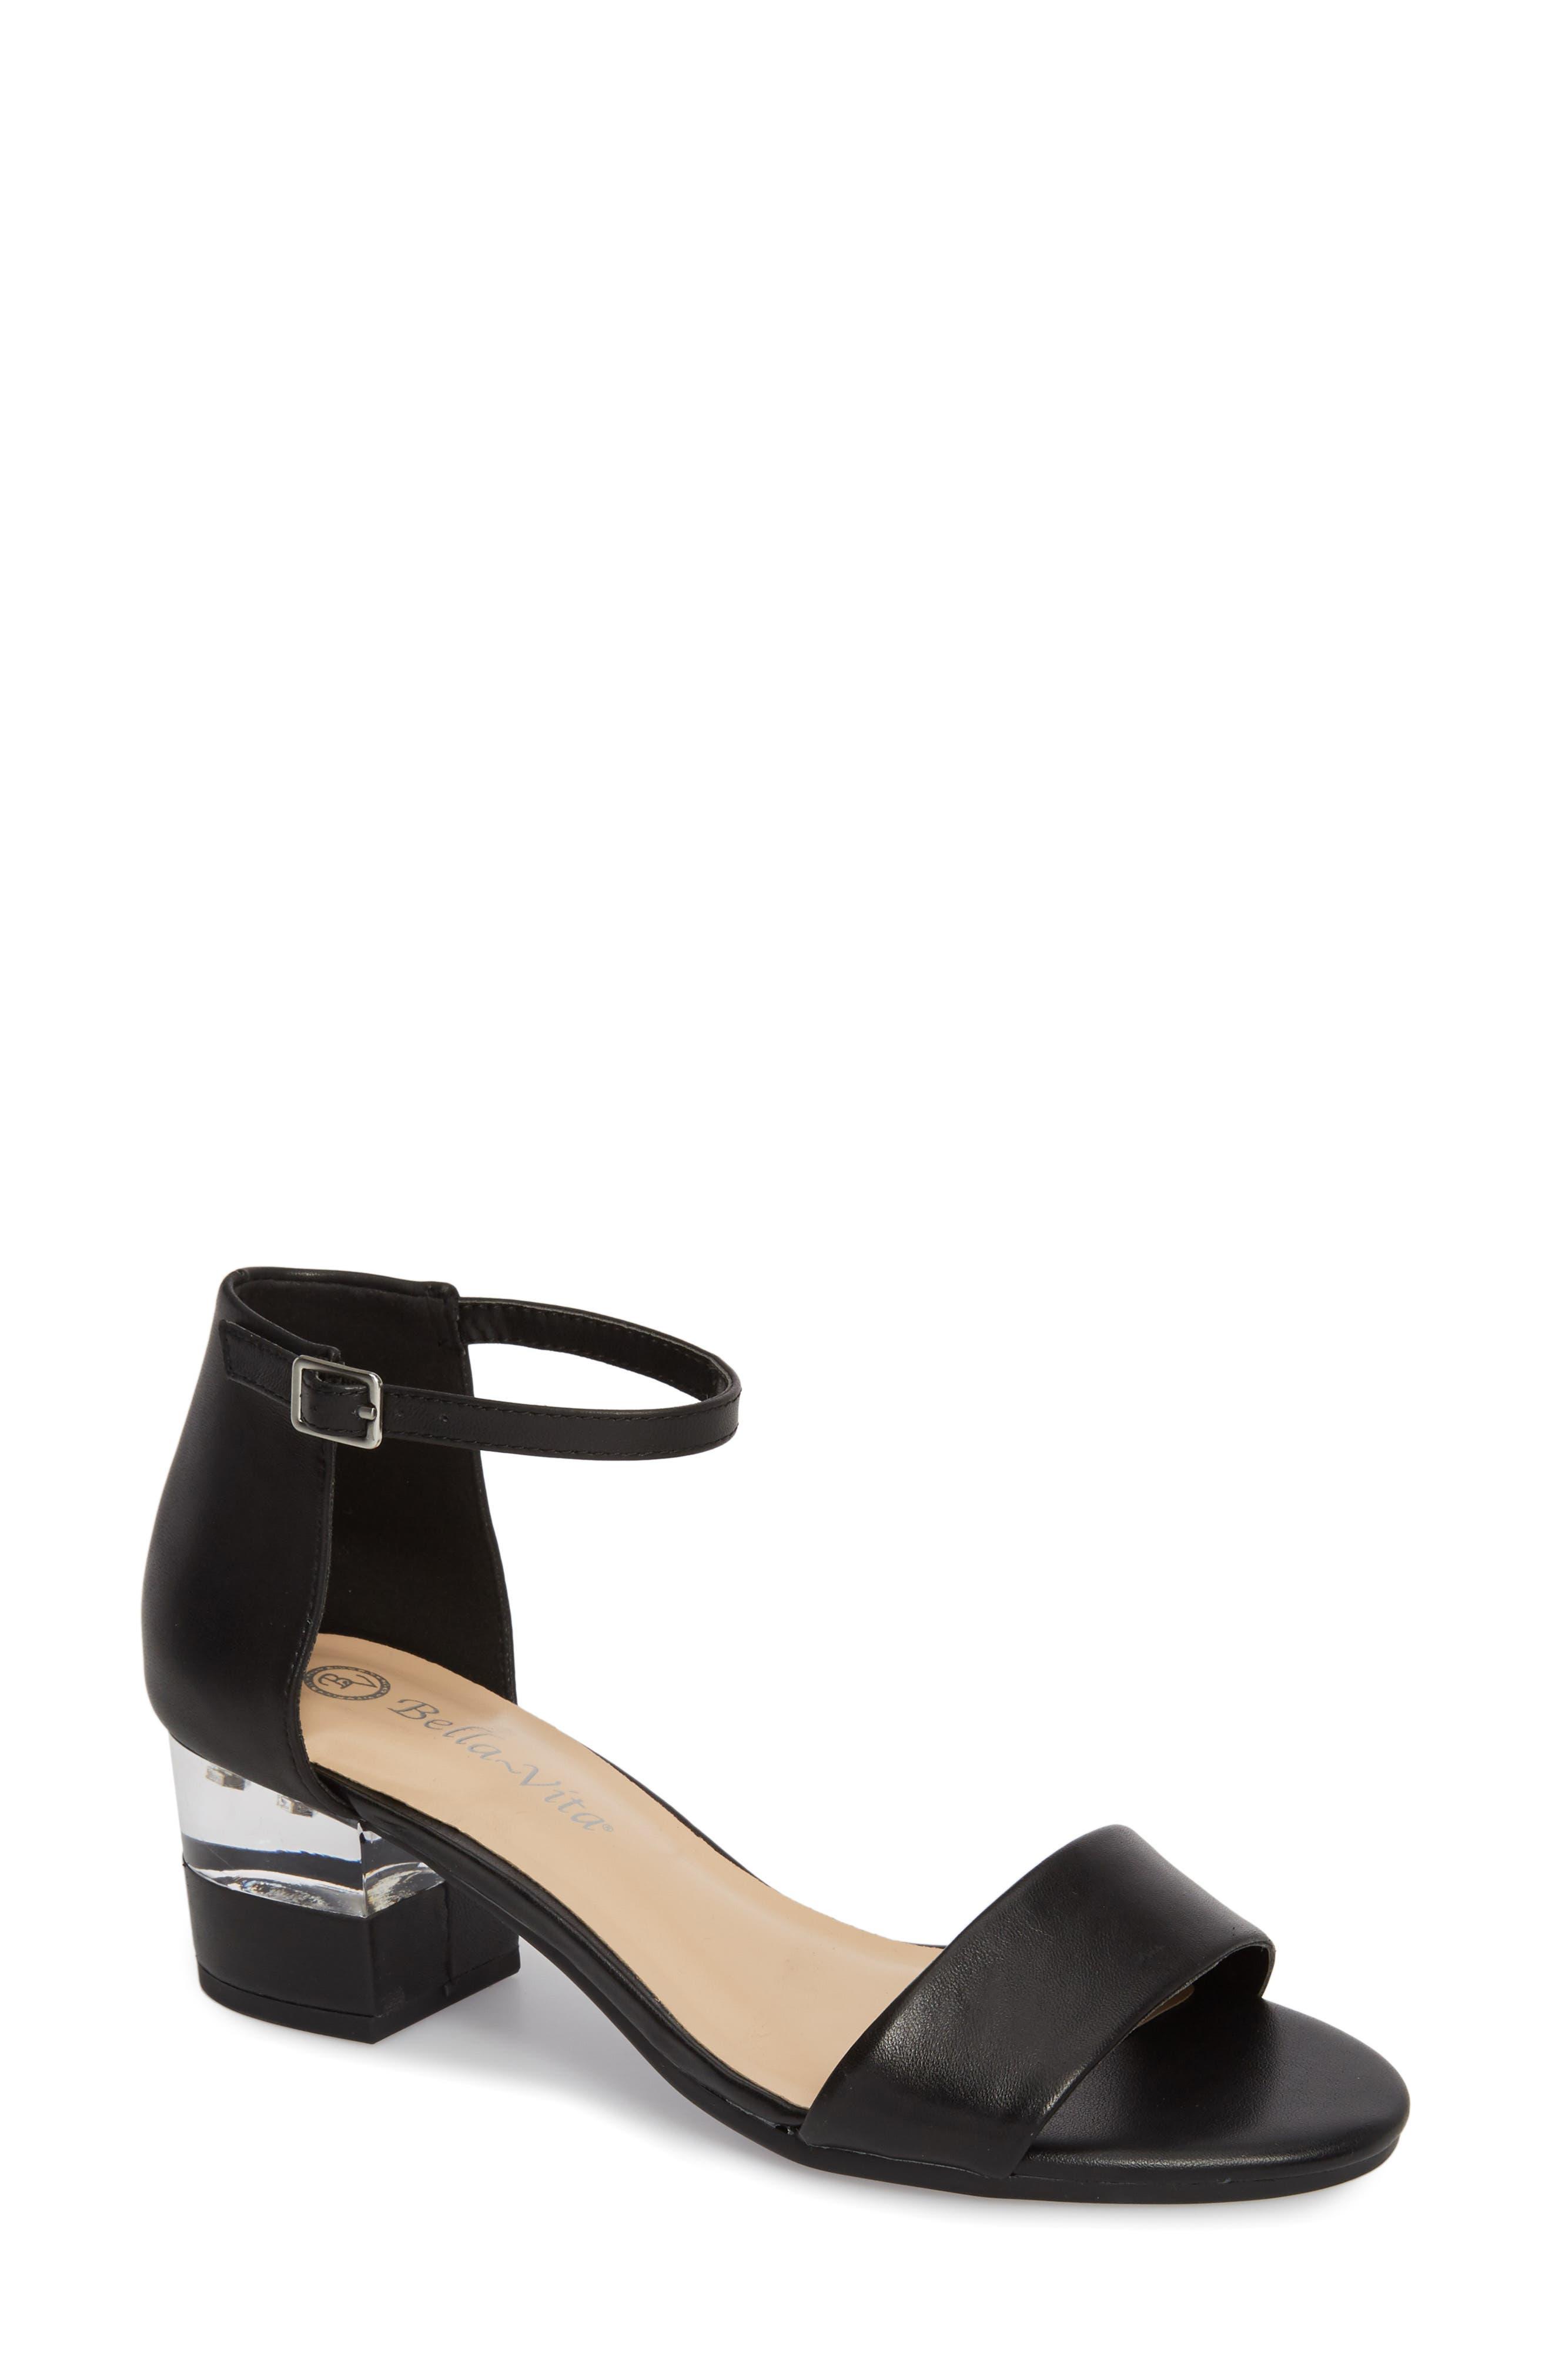 Fitz Block Heel Sandal,                             Main thumbnail 1, color,                             BLACK LEATHER